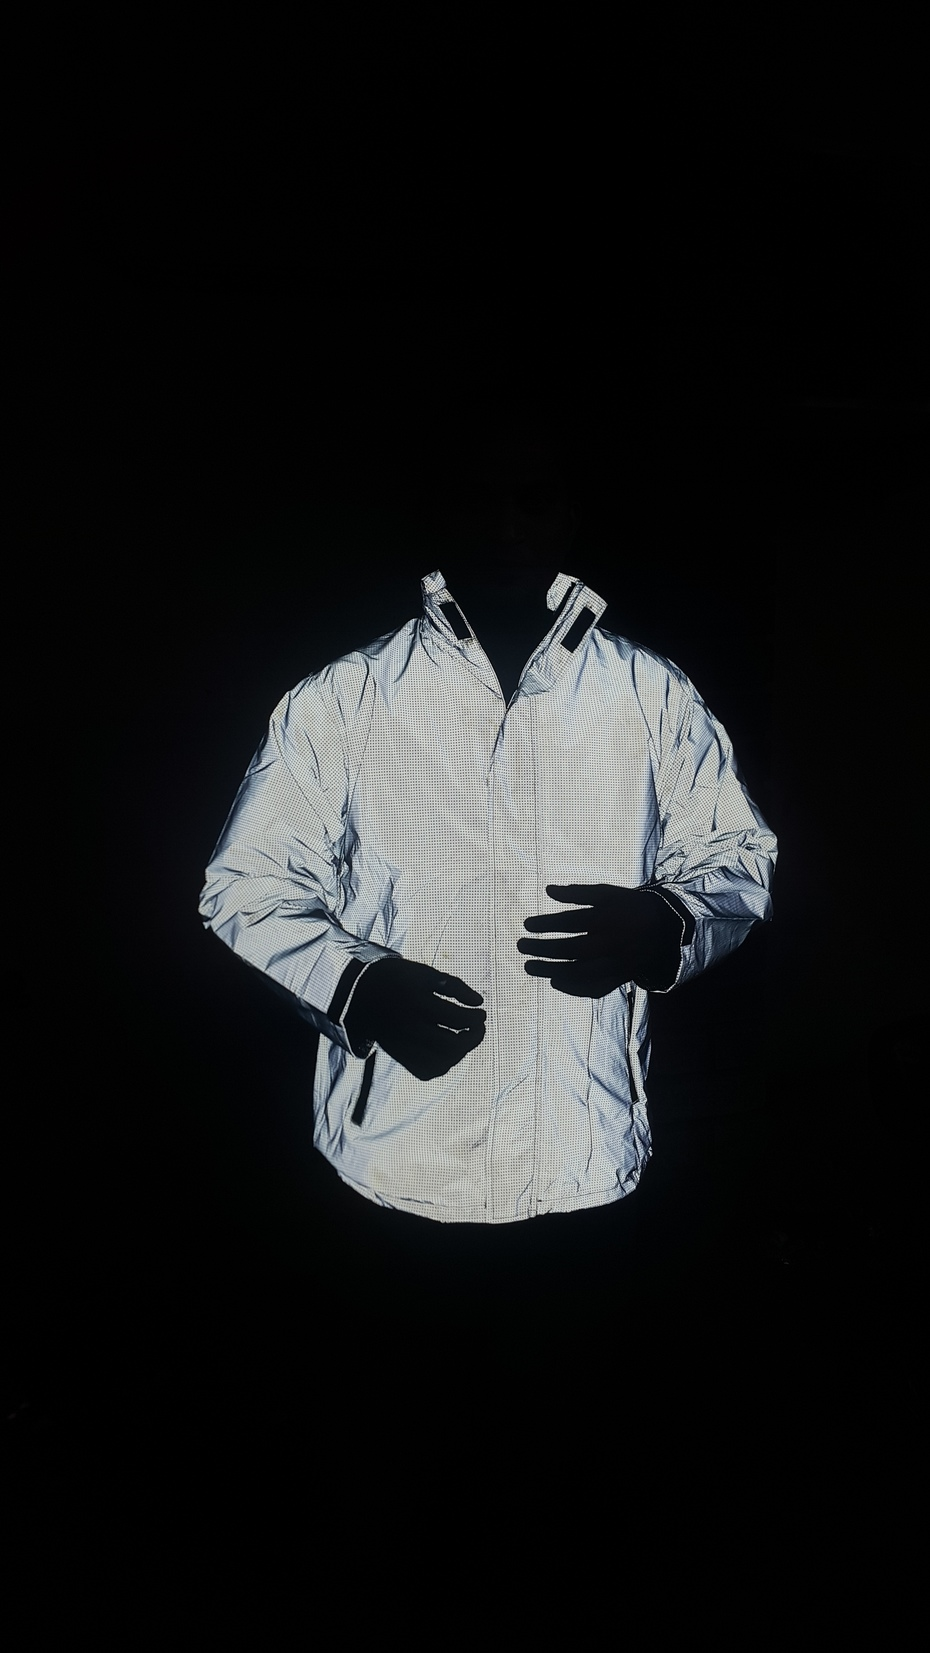 Reflective jacket under mobile flash